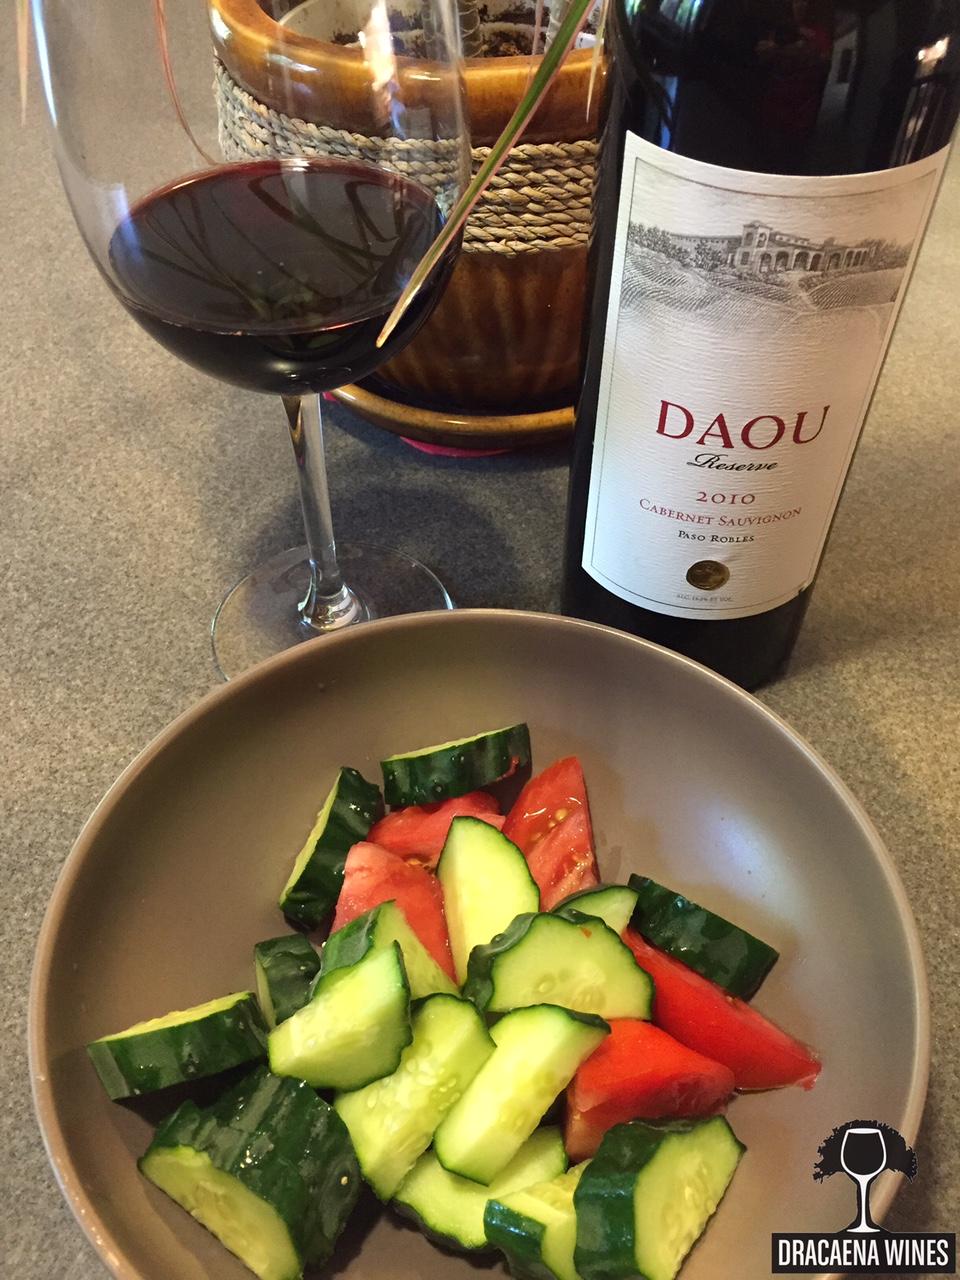 Exploring the Wine Glass July 22, 2015 • Dracaena Wines